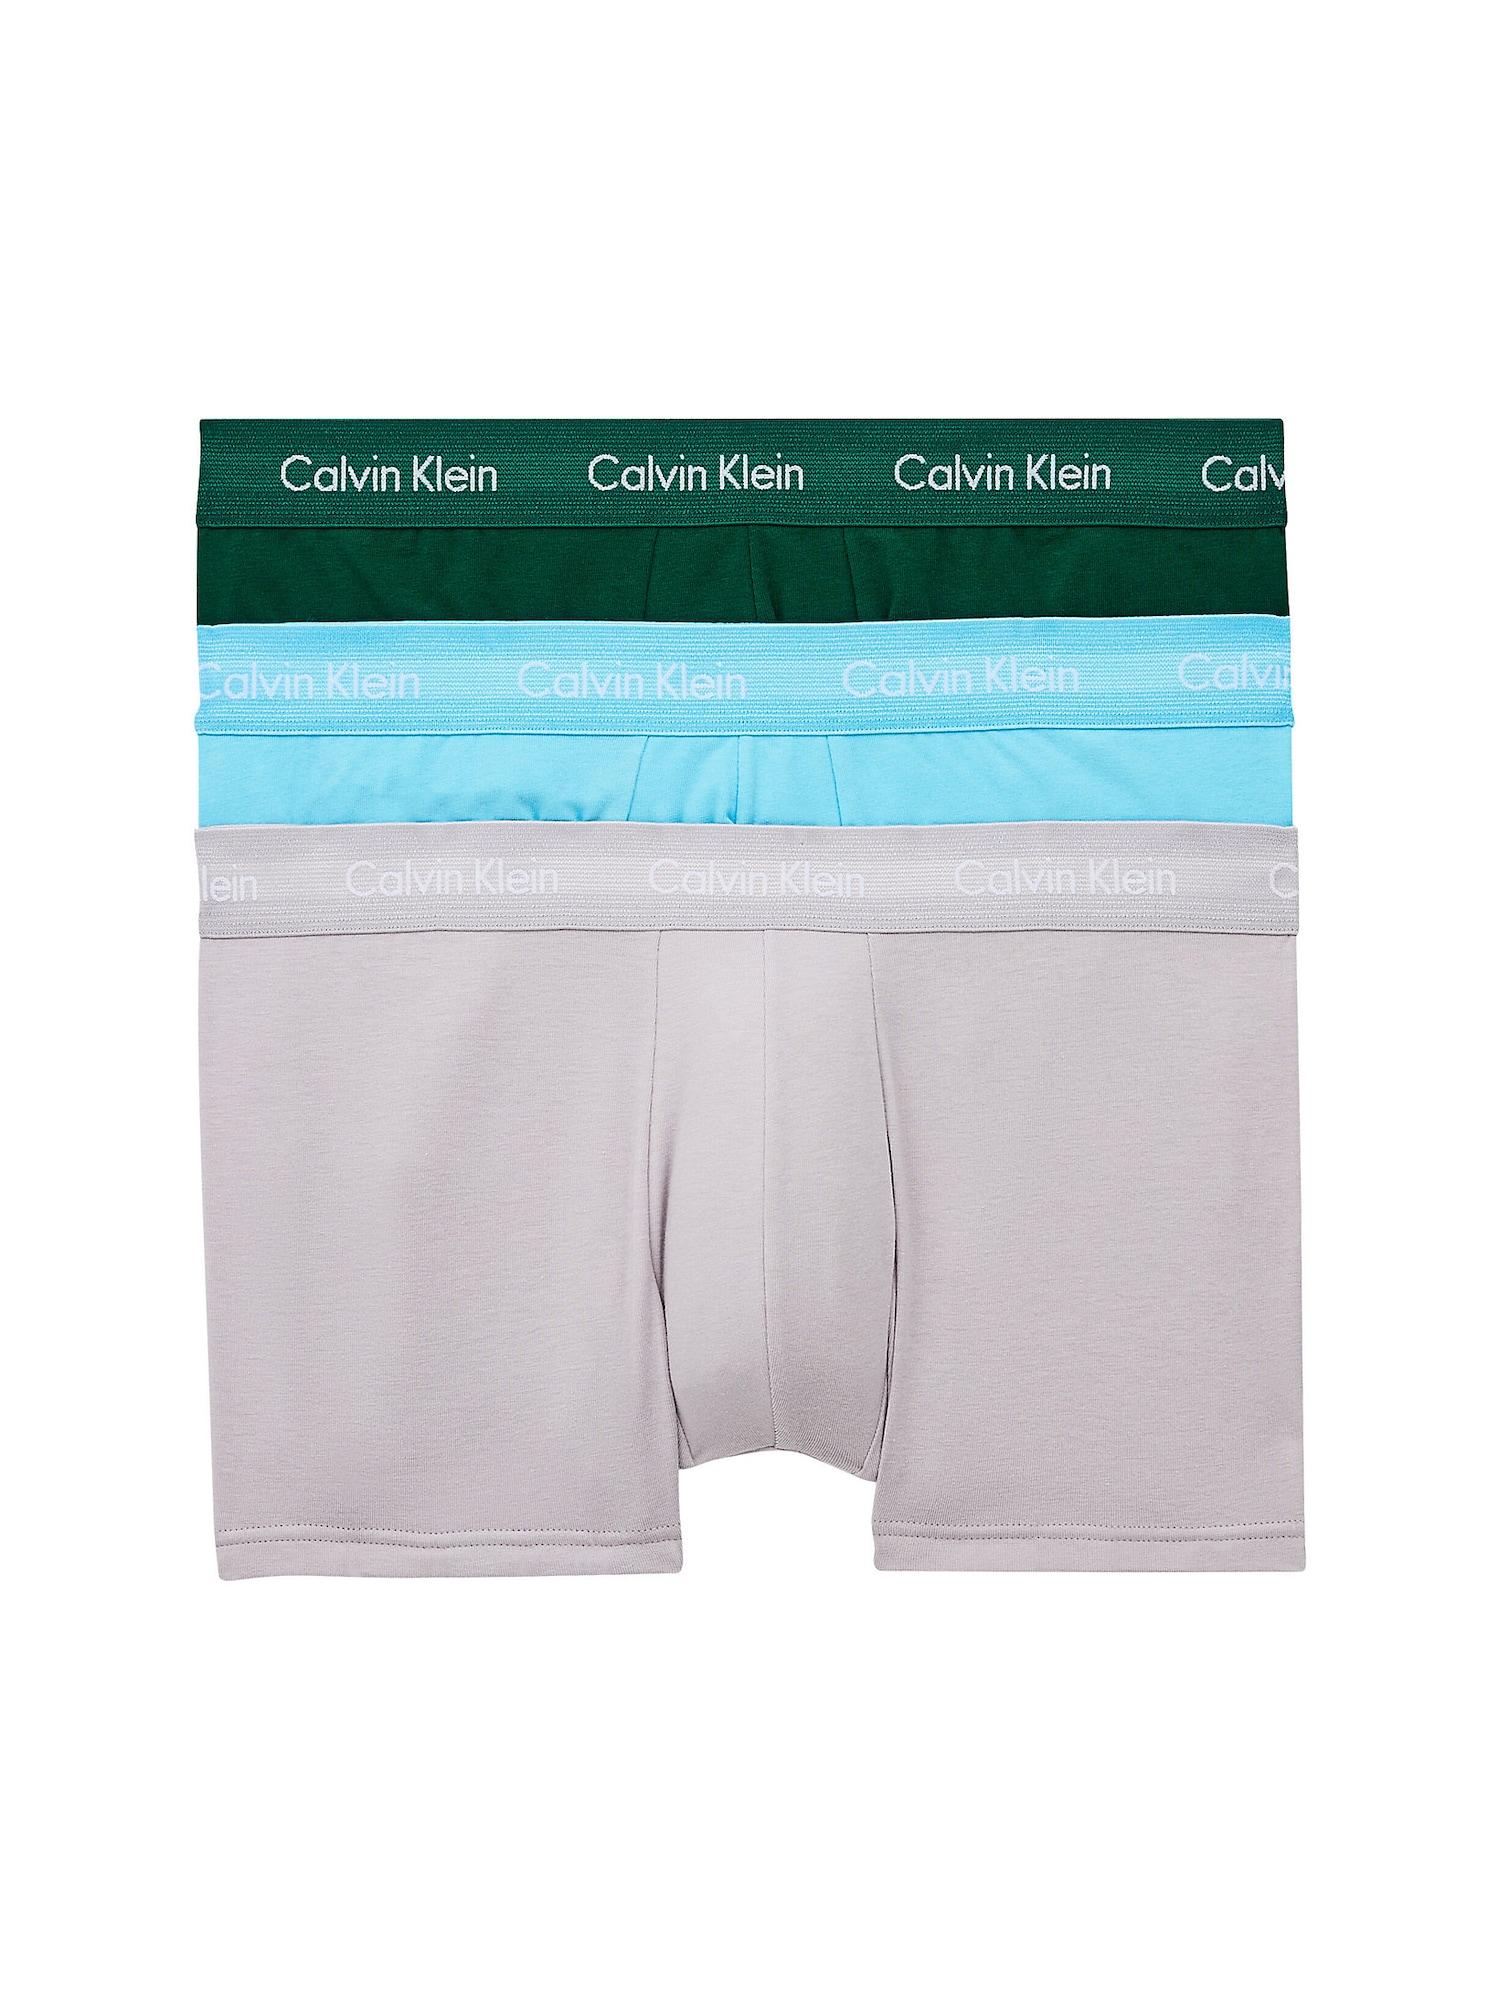 Calvin Klein Underwear Boxer trumpikės įdegio spalva / vandens spalva / pilka